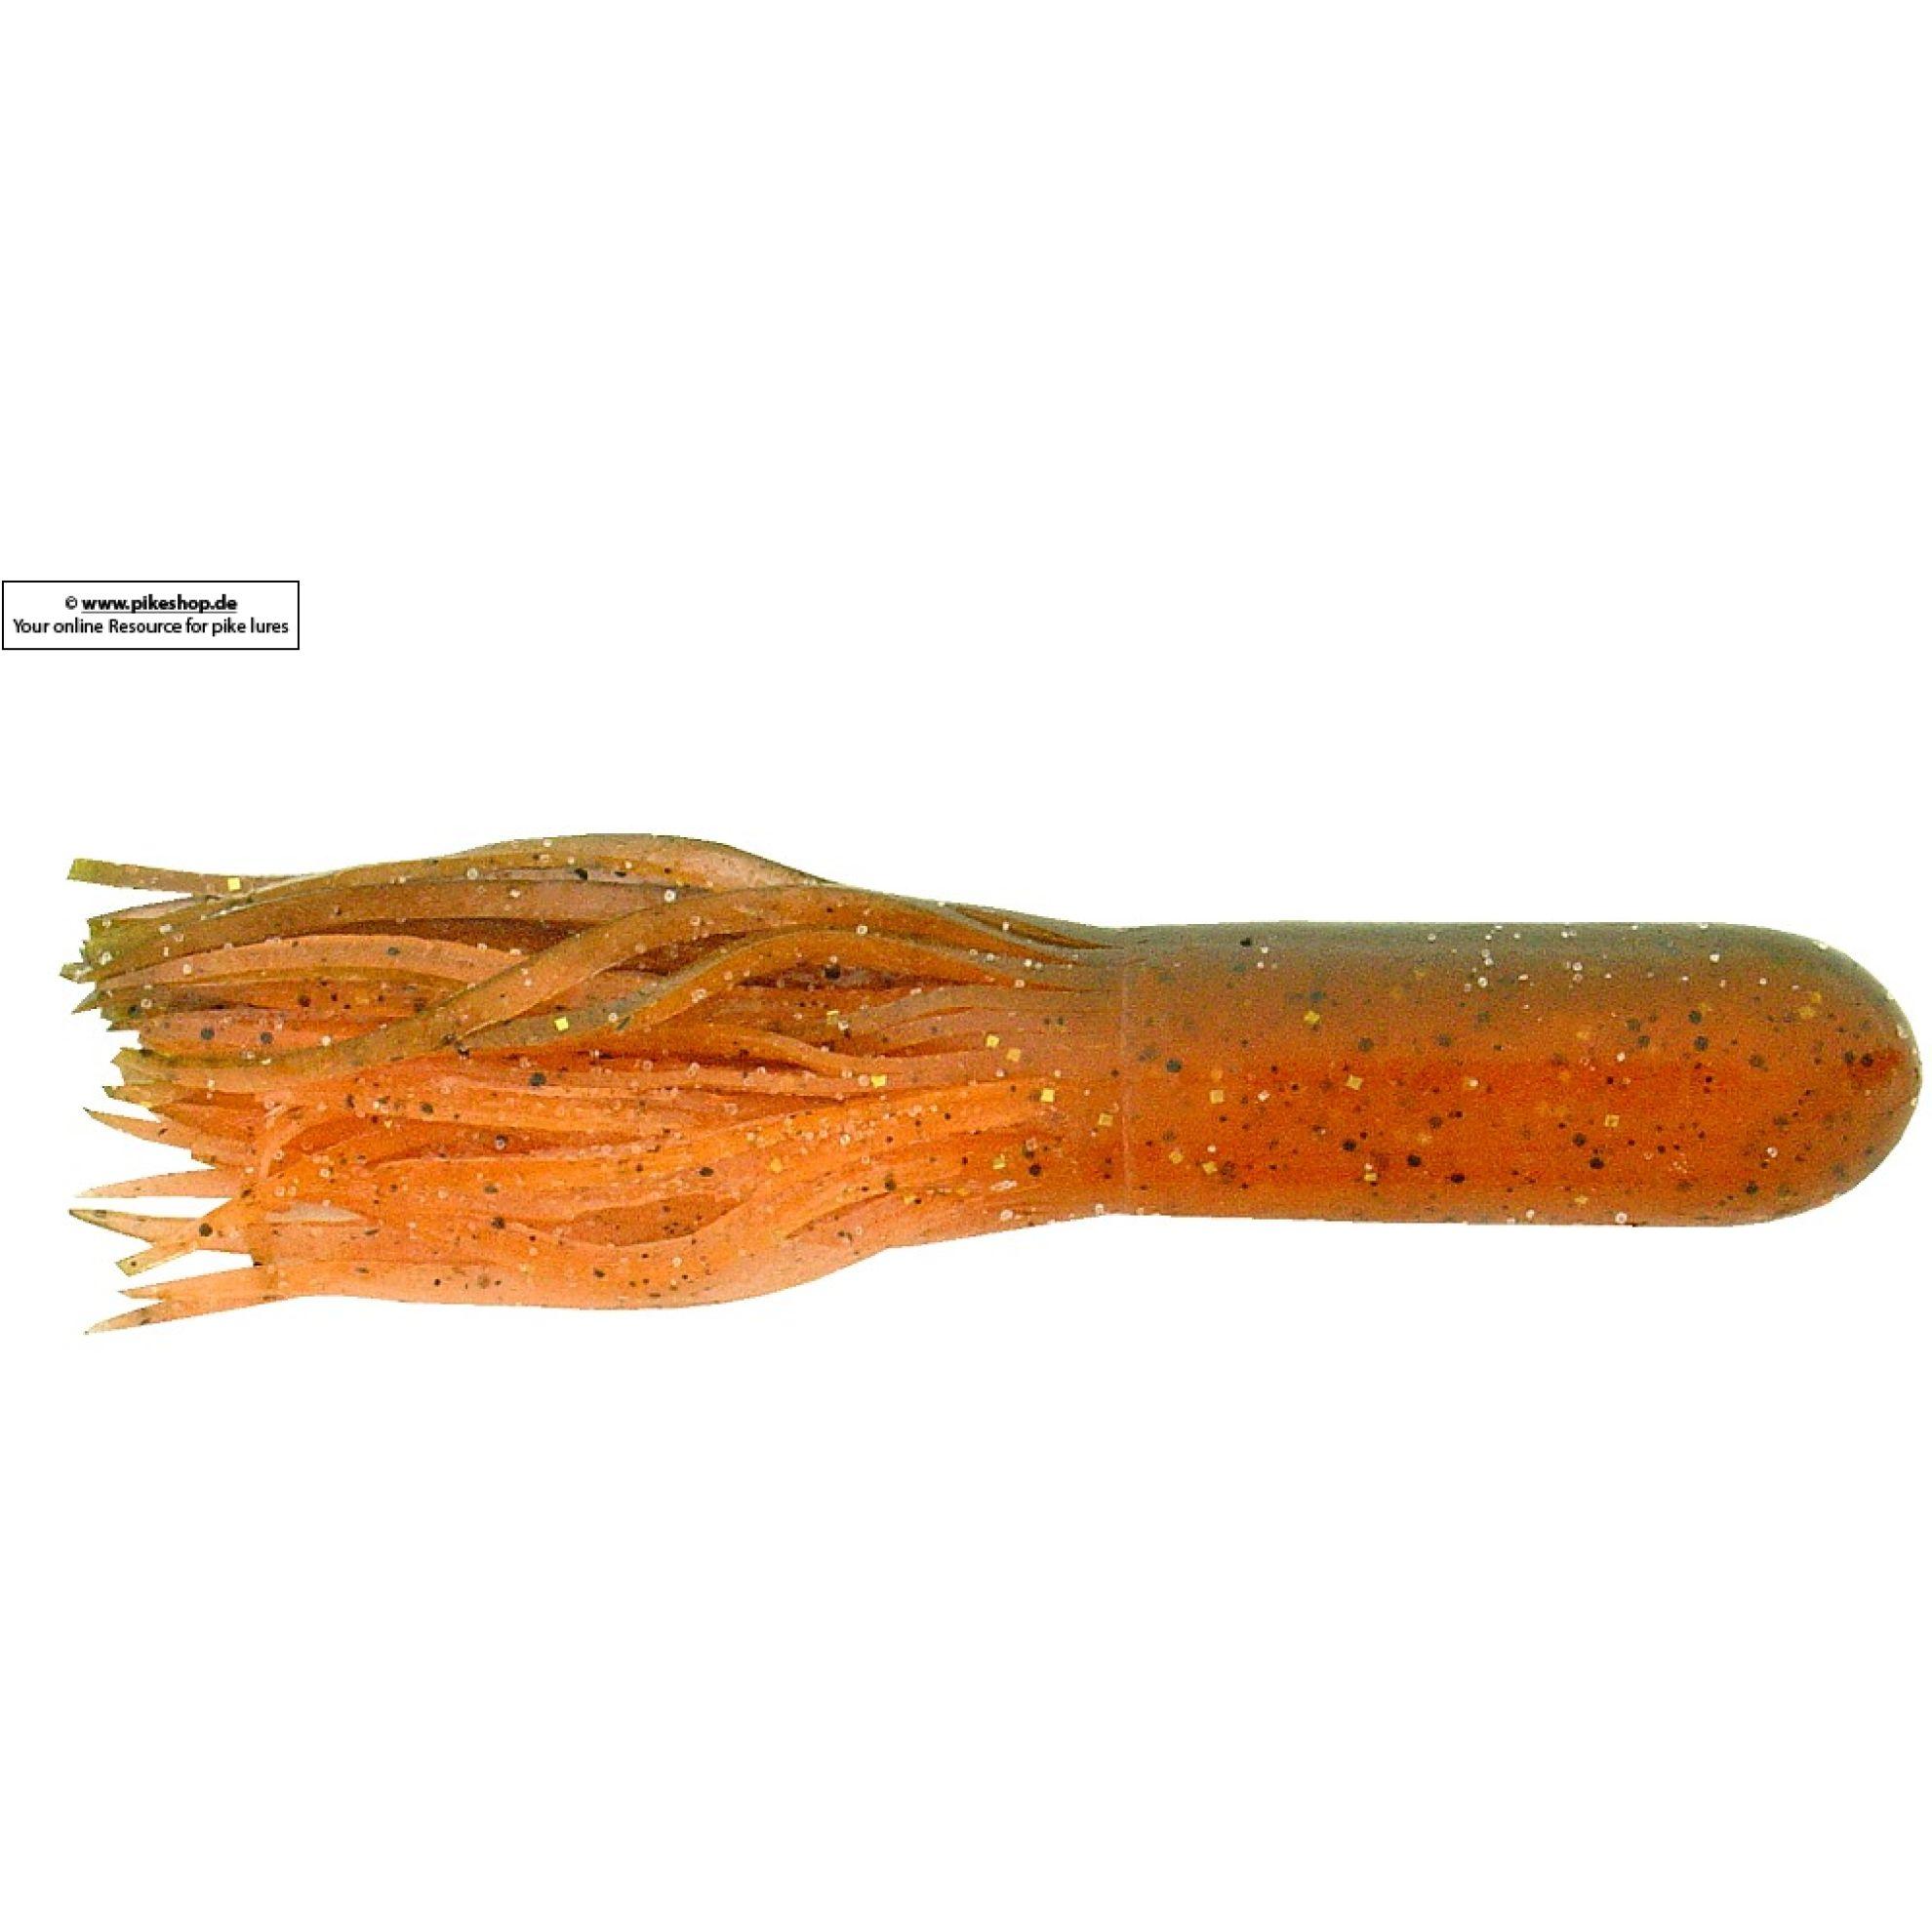 tubezilla